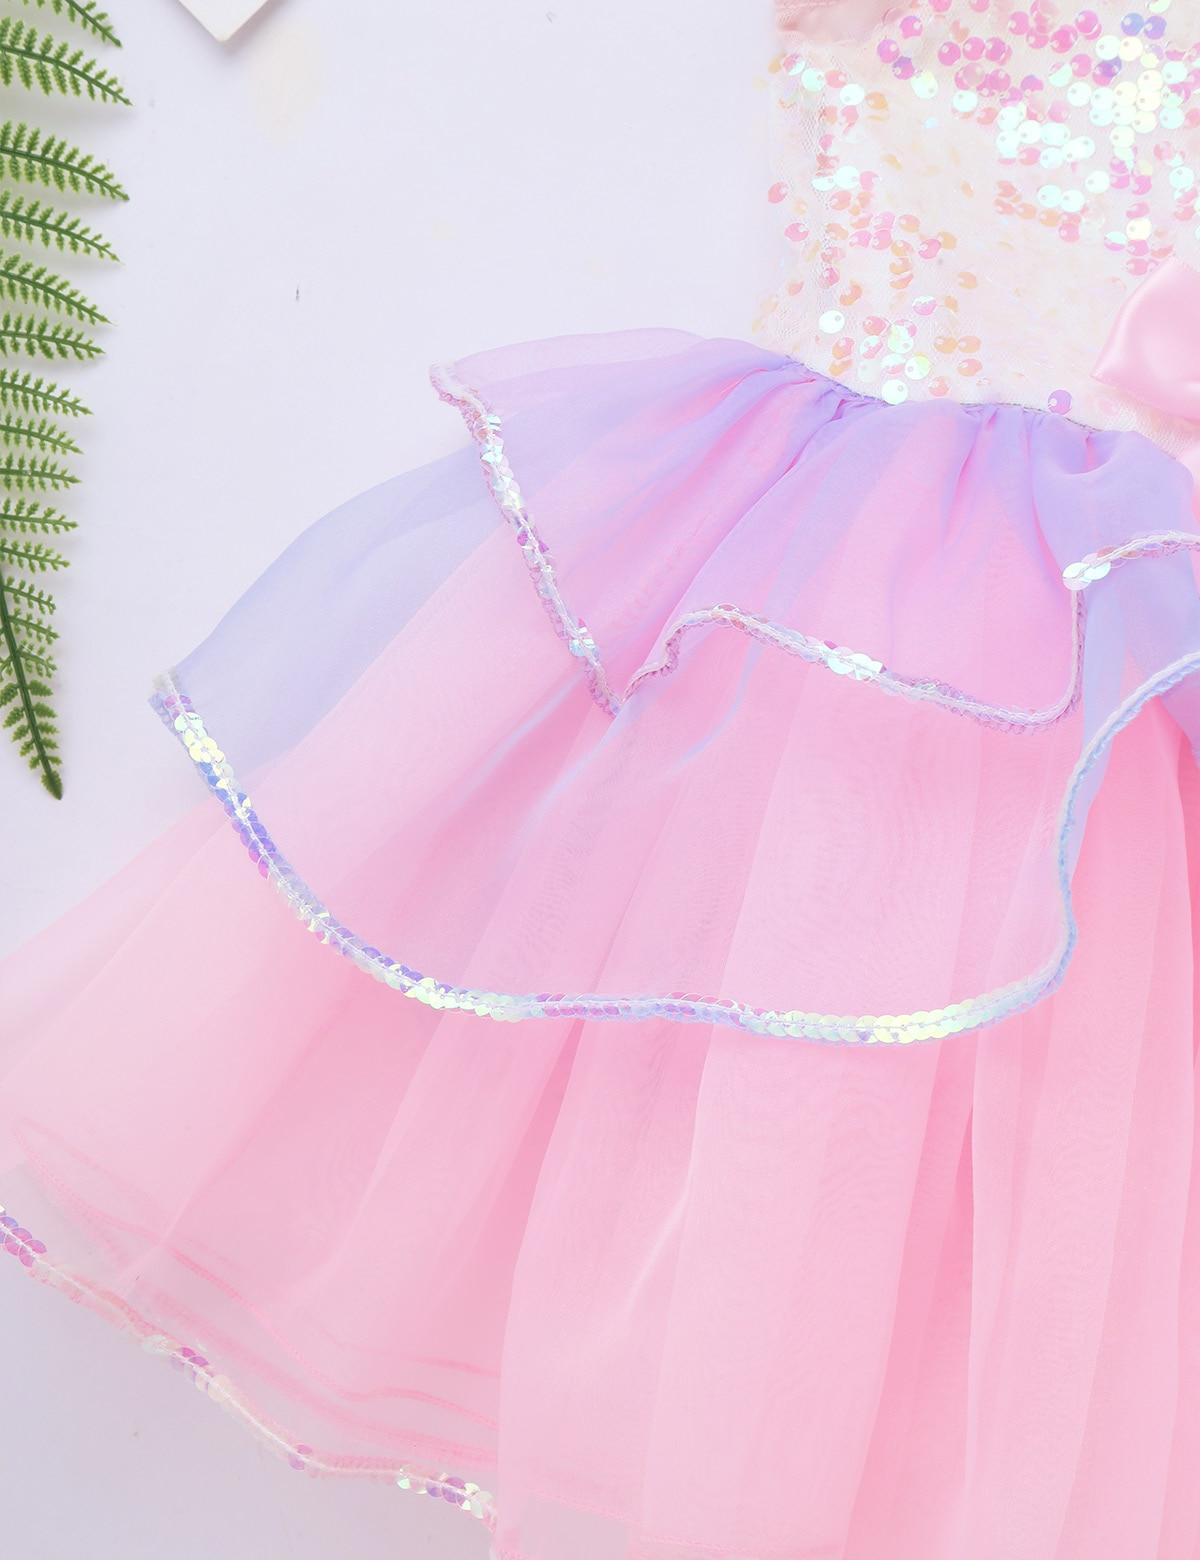 Tutu Ballet Dress for Girls ballerina tulle costume Shiny Sequins Mesh Splice Bowknot Ballet Dance Gymnastics Leotard Tutu Dress